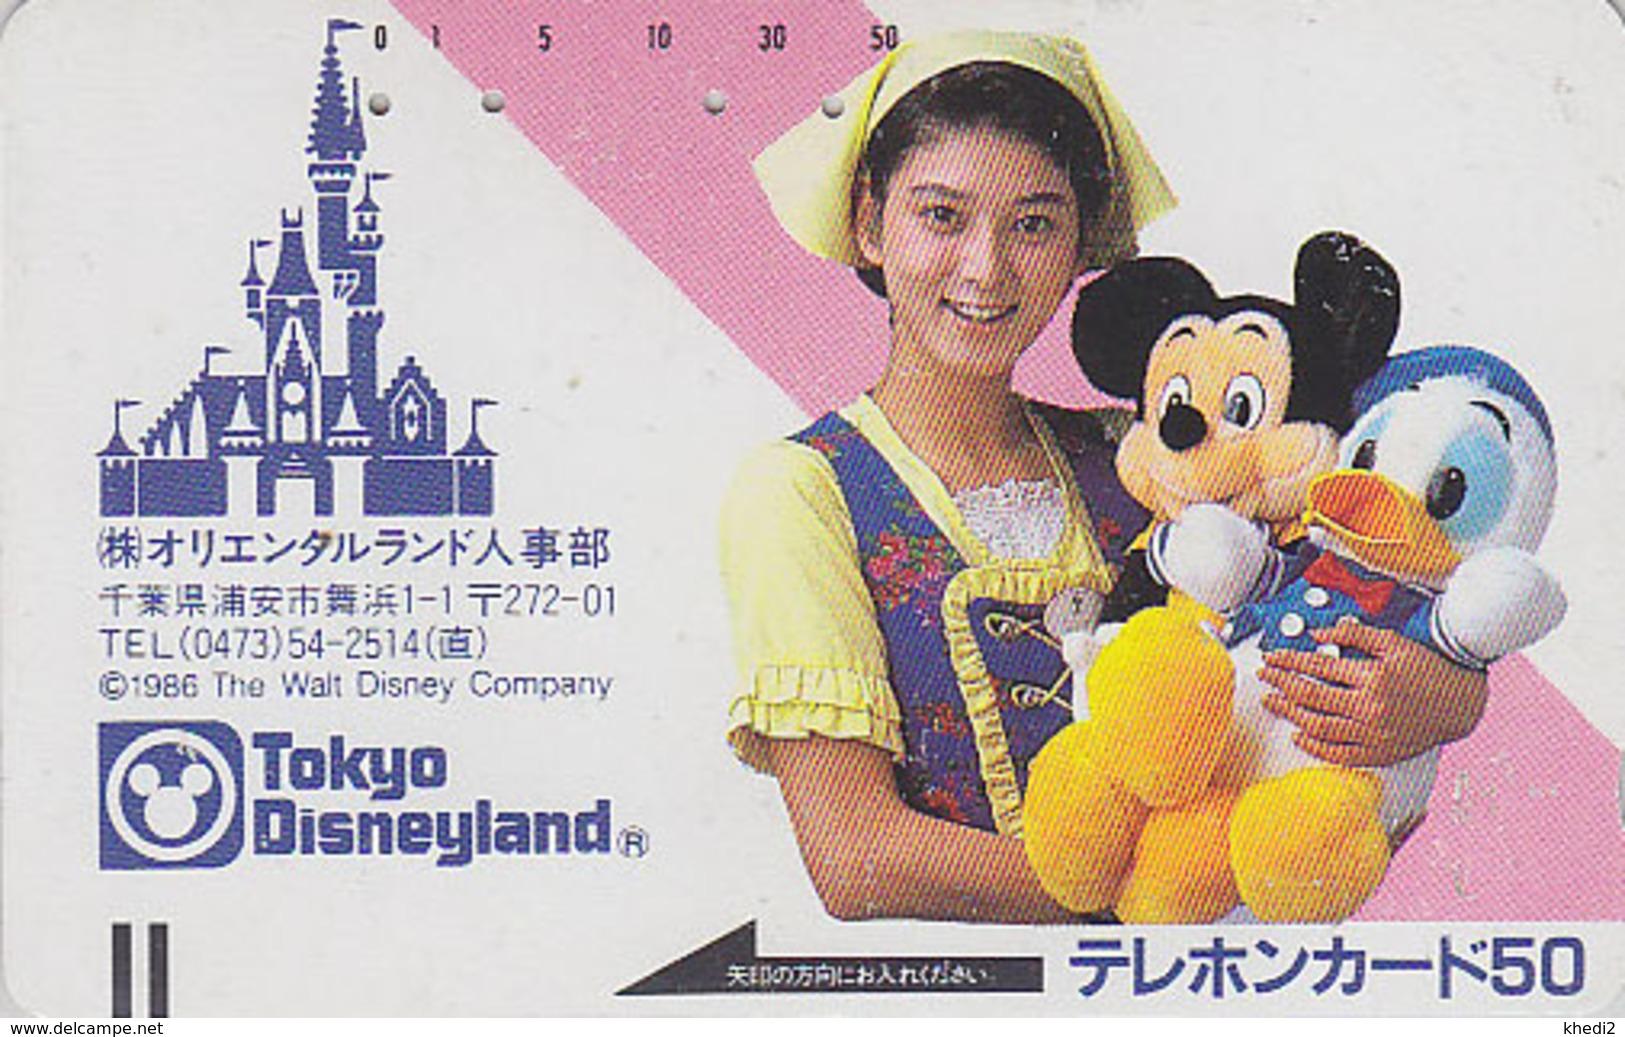 RR TRES RARE Télécarte Ancienne Japon DISNEY / 110-9767 - Japan Front Bar Phonecard / A - Balken Telefonkarte - Disney